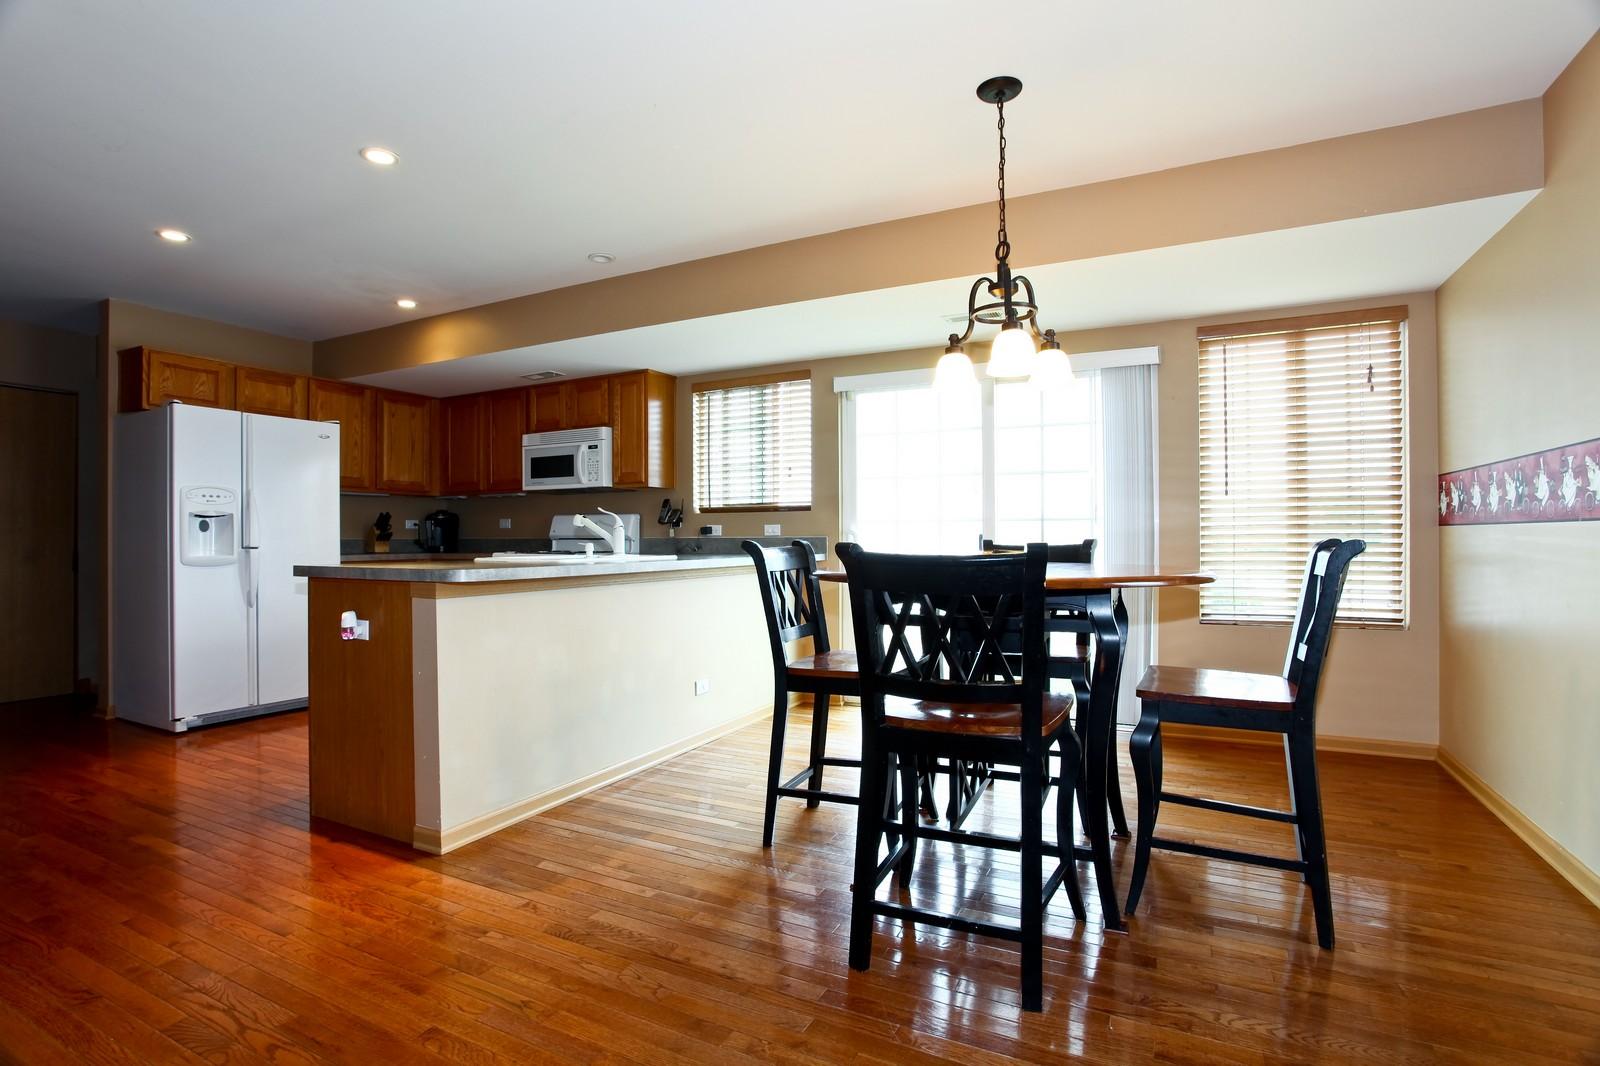 Real Estate Photography - 1745 Rebecca Lane, Aurora, IL, 60504 - Kitchen / Dining Room